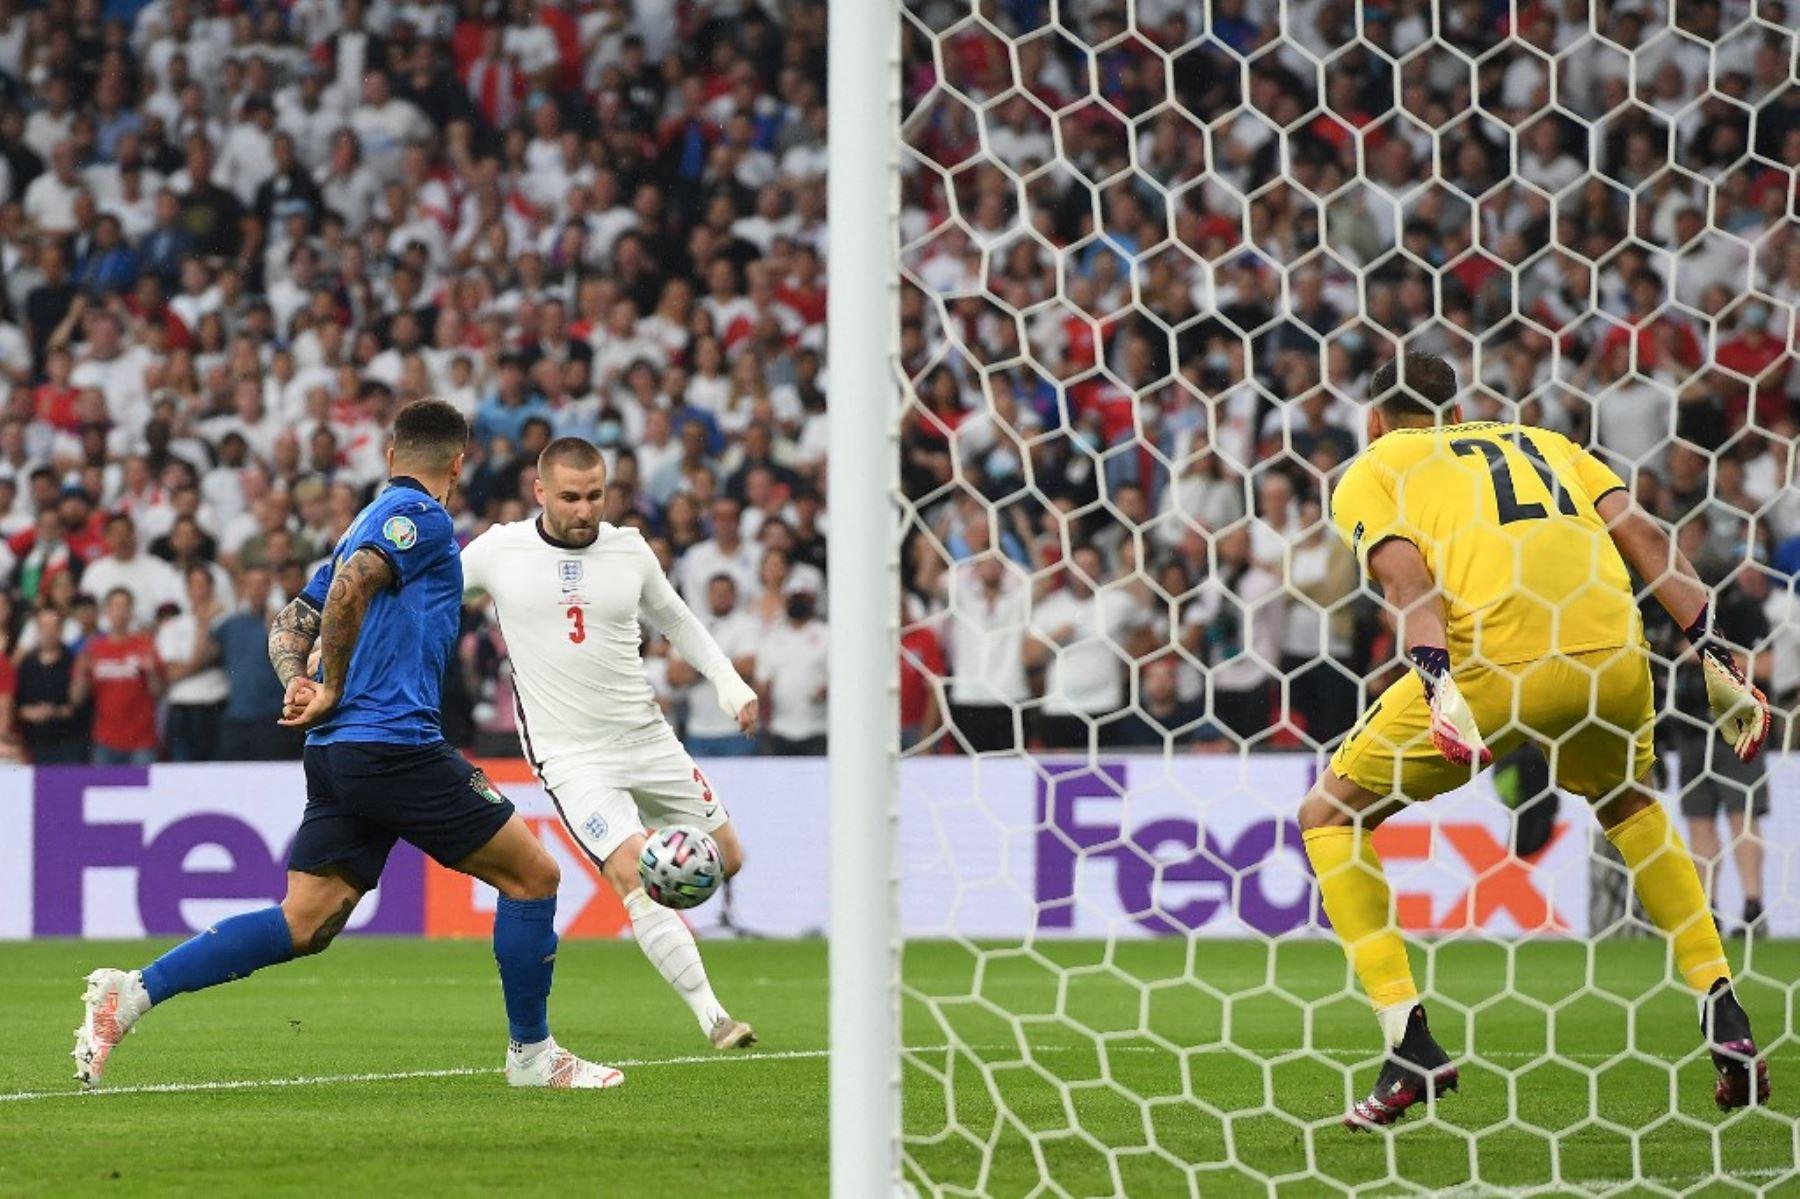 Luke Shaw anota el primer gol para Inglaterra